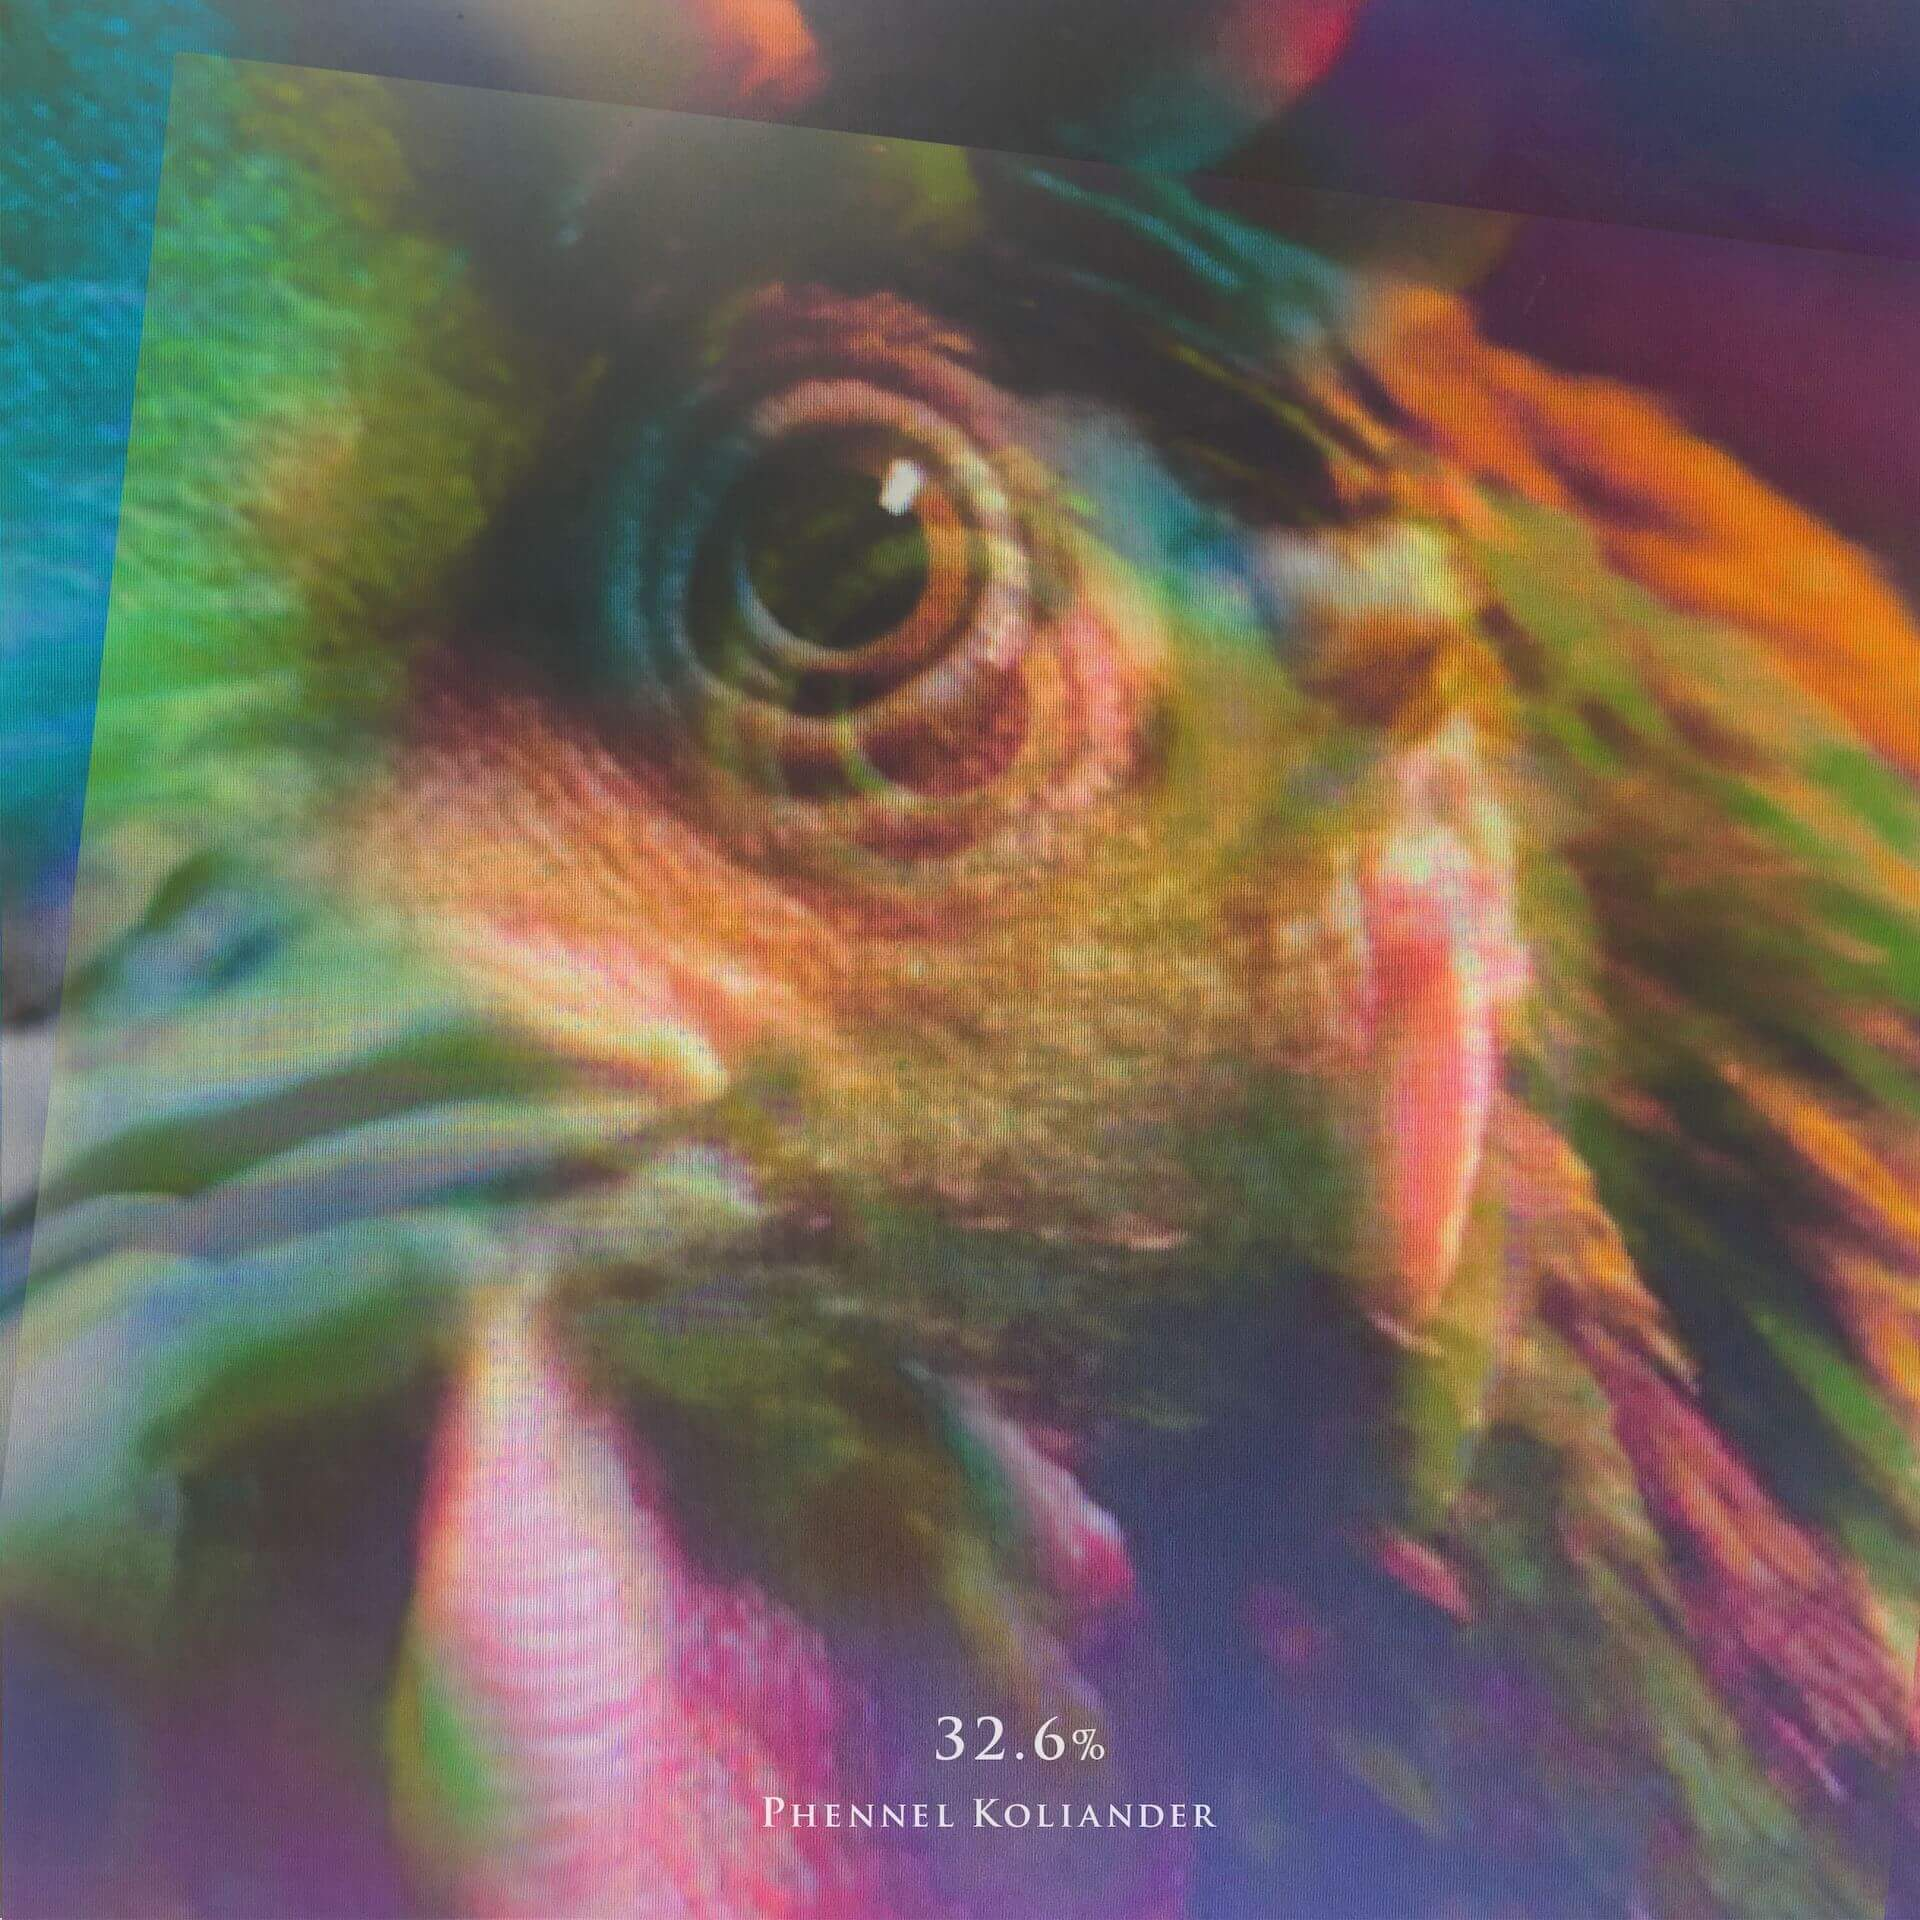 WONK擁する〈EPISTROPH〉のビートメイカーPhennel Kolianderがリリース企画『%』の第2段『32.6%』をデジタルリリース! music200825_phennelkoliander_1